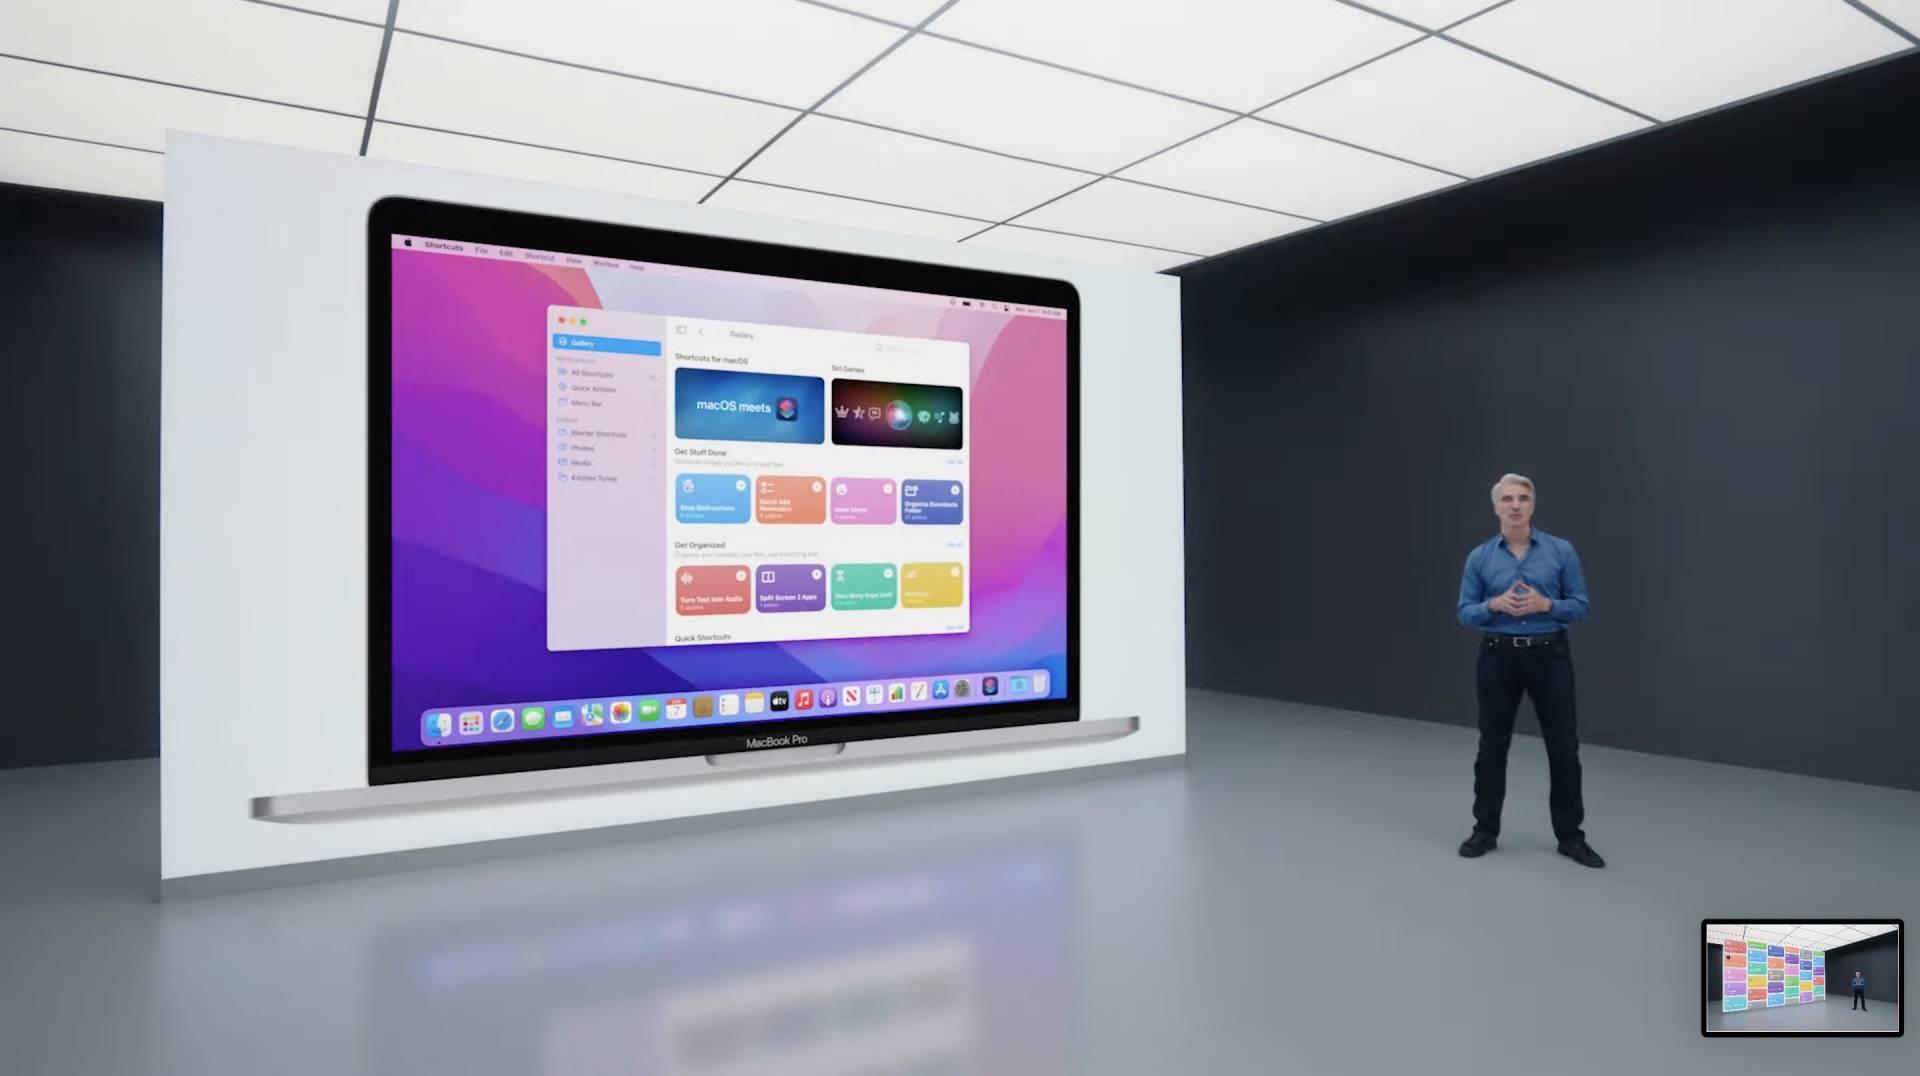 macOS 12 Monterey novinky - WWDC 2021